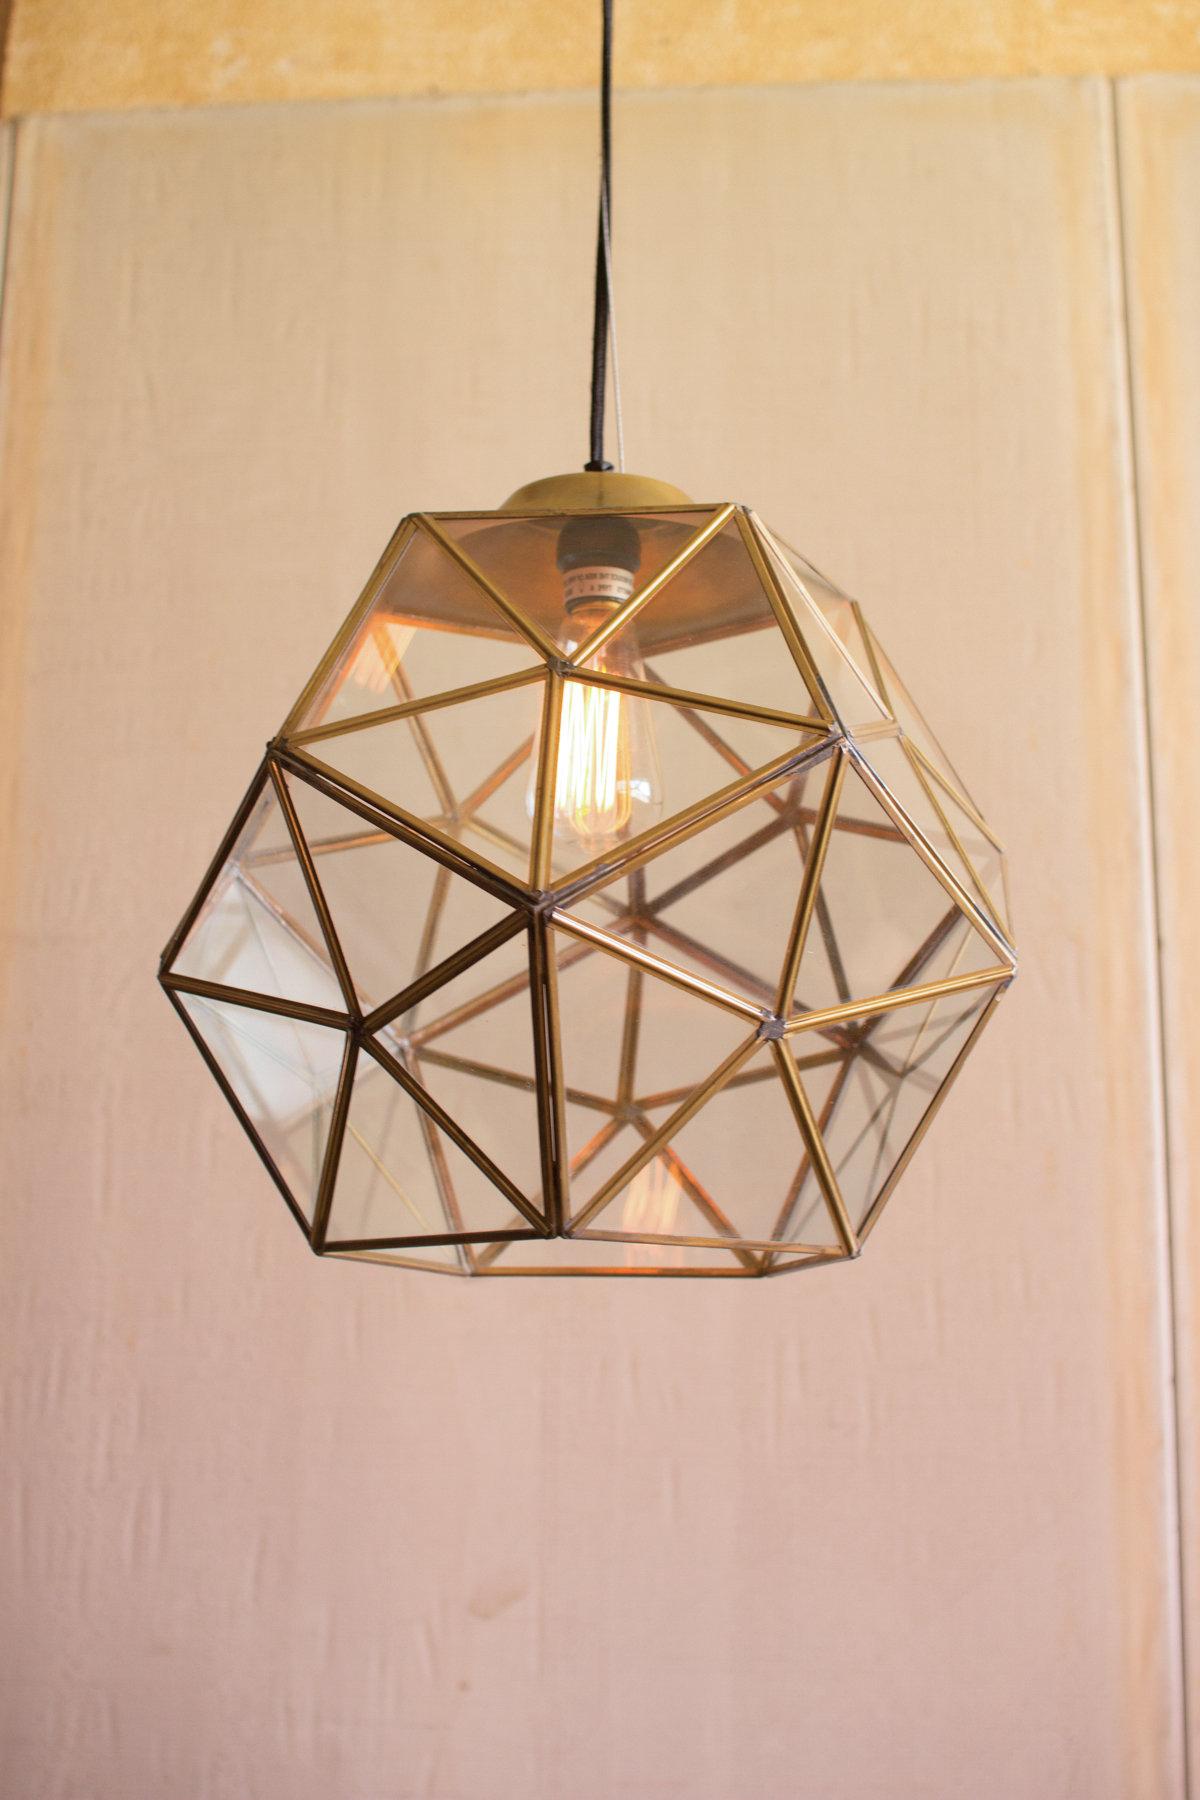 Edelman Glass 1 Light Lantern Pendant Pertaining To Most Up To Date Delon 1 Light Lantern Geometric Pendants (View 13 of 25)